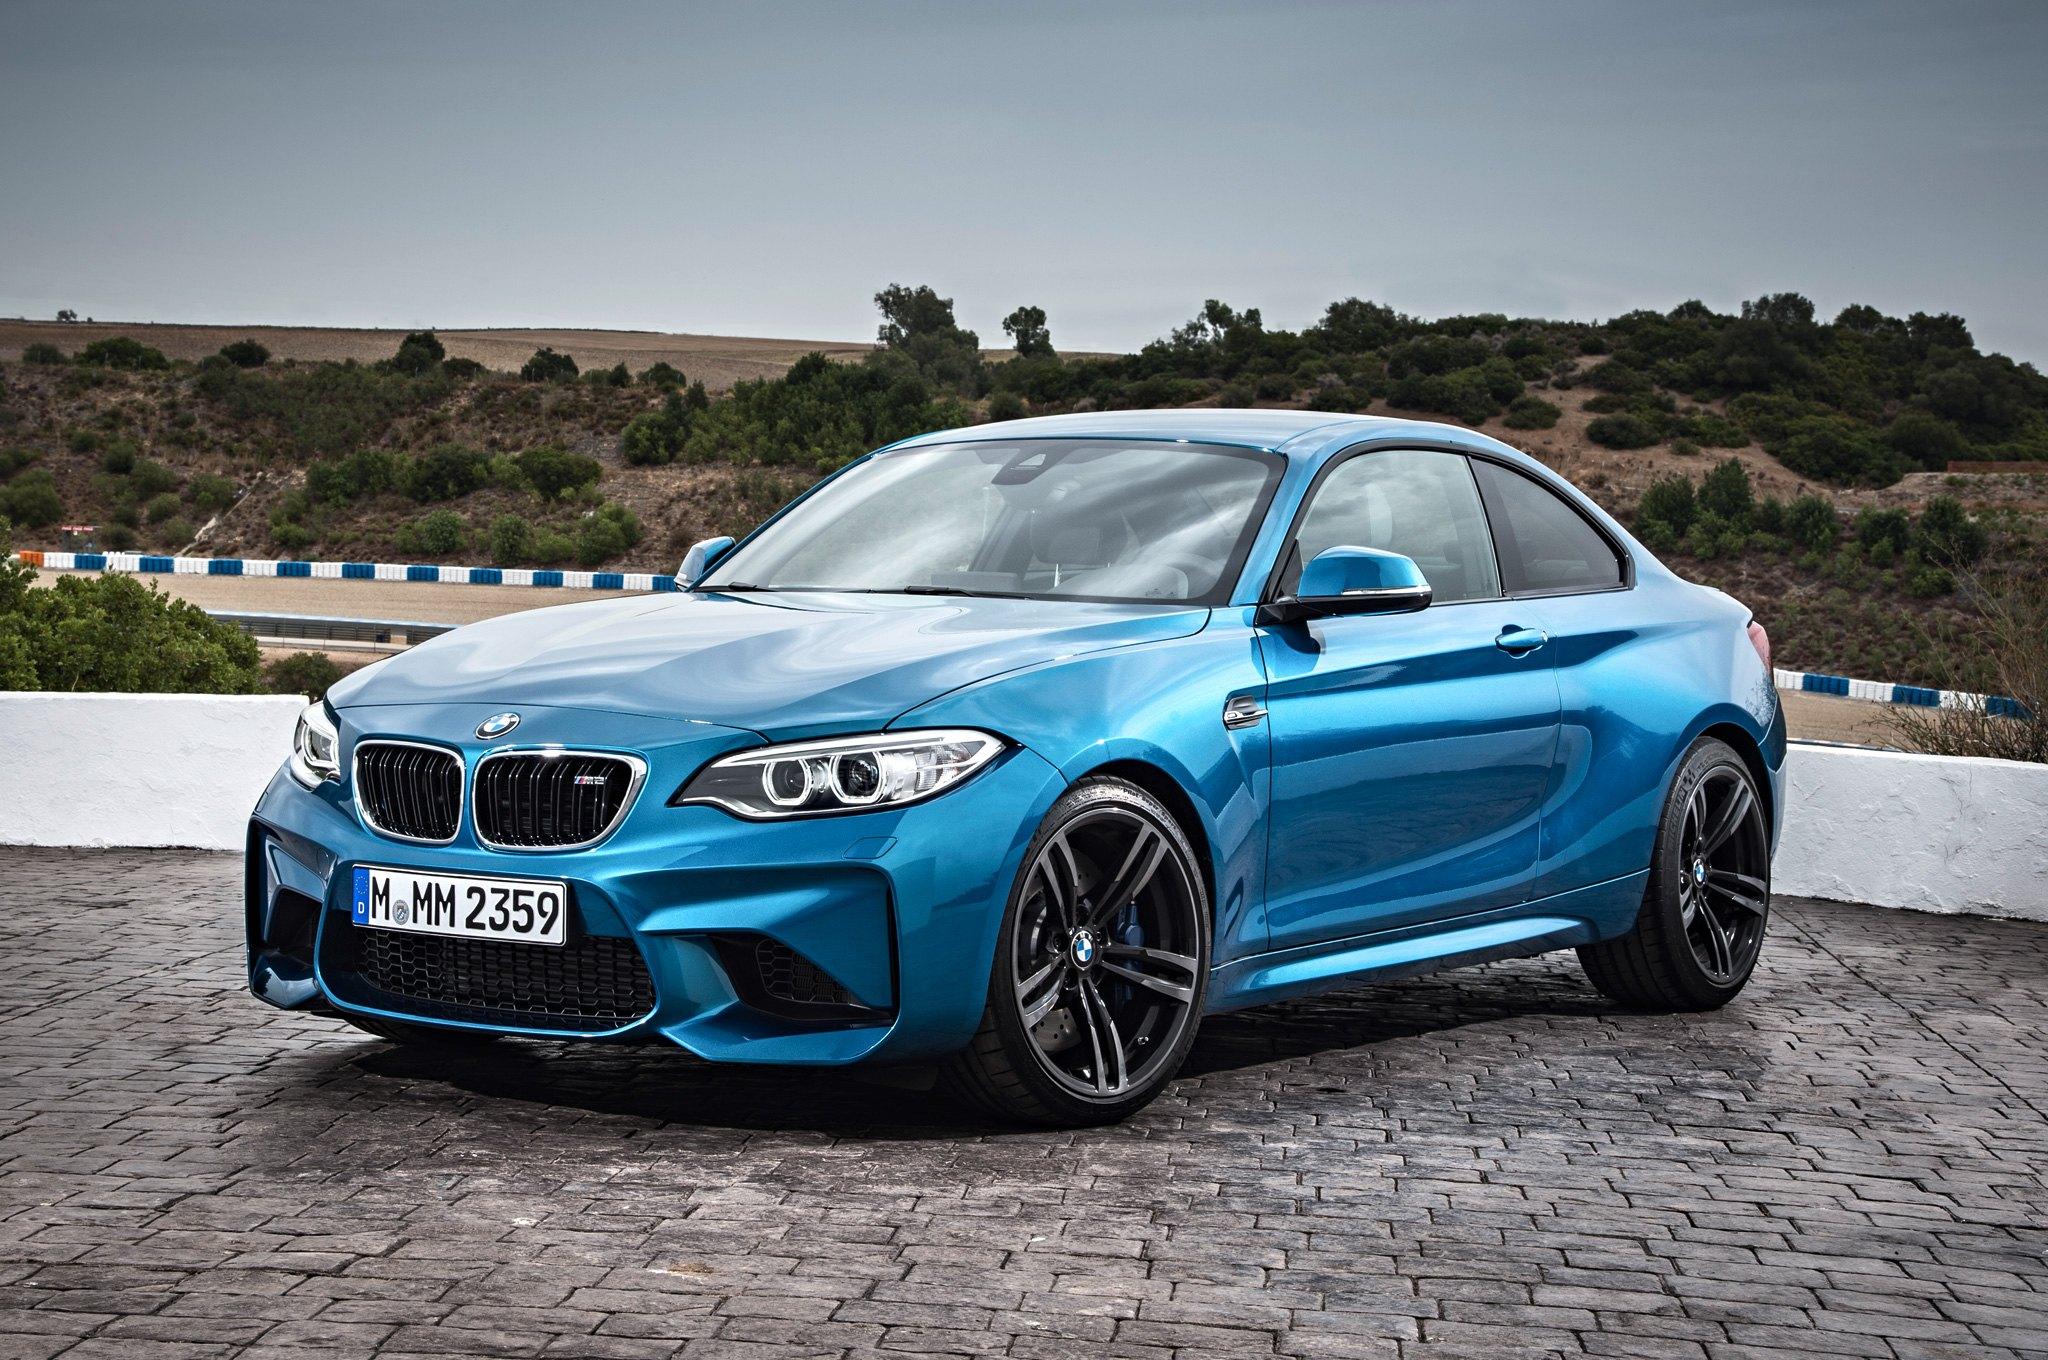 2016-BMW-M2-Coupe-front-three-quarter-04